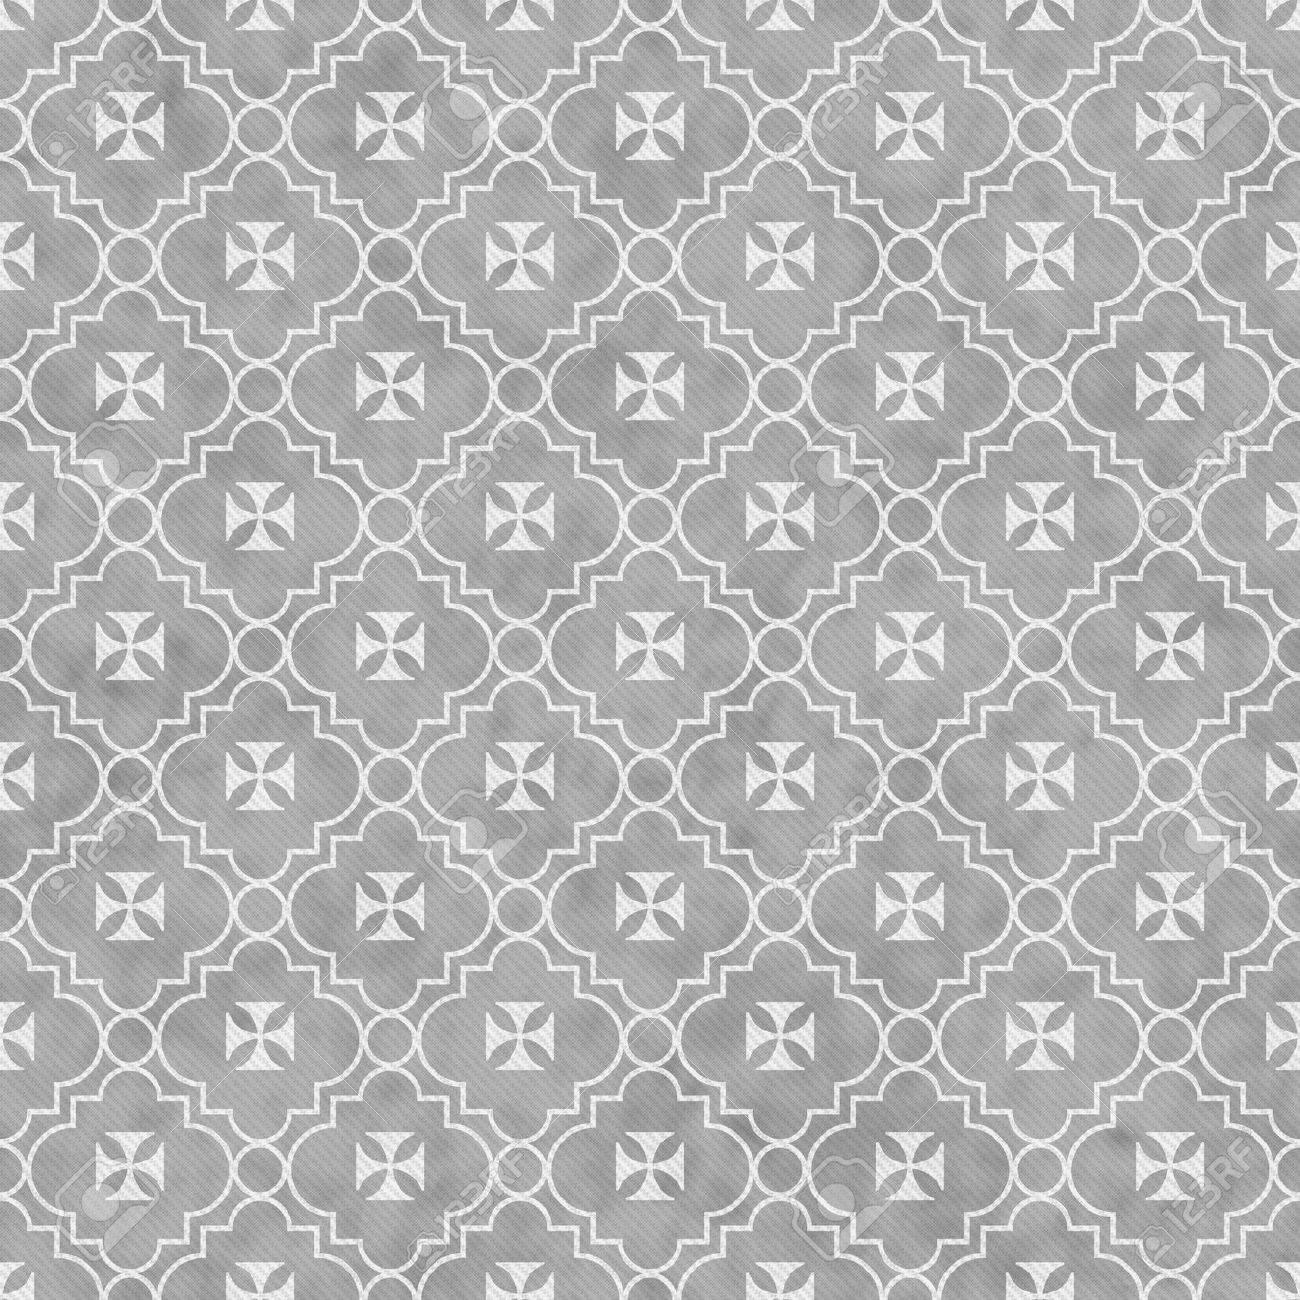 Gray and white maltese cross symbol tile pattern repeat background gray and white maltese cross symbol tile pattern repeat background that is seamless and repeats stock biocorpaavc